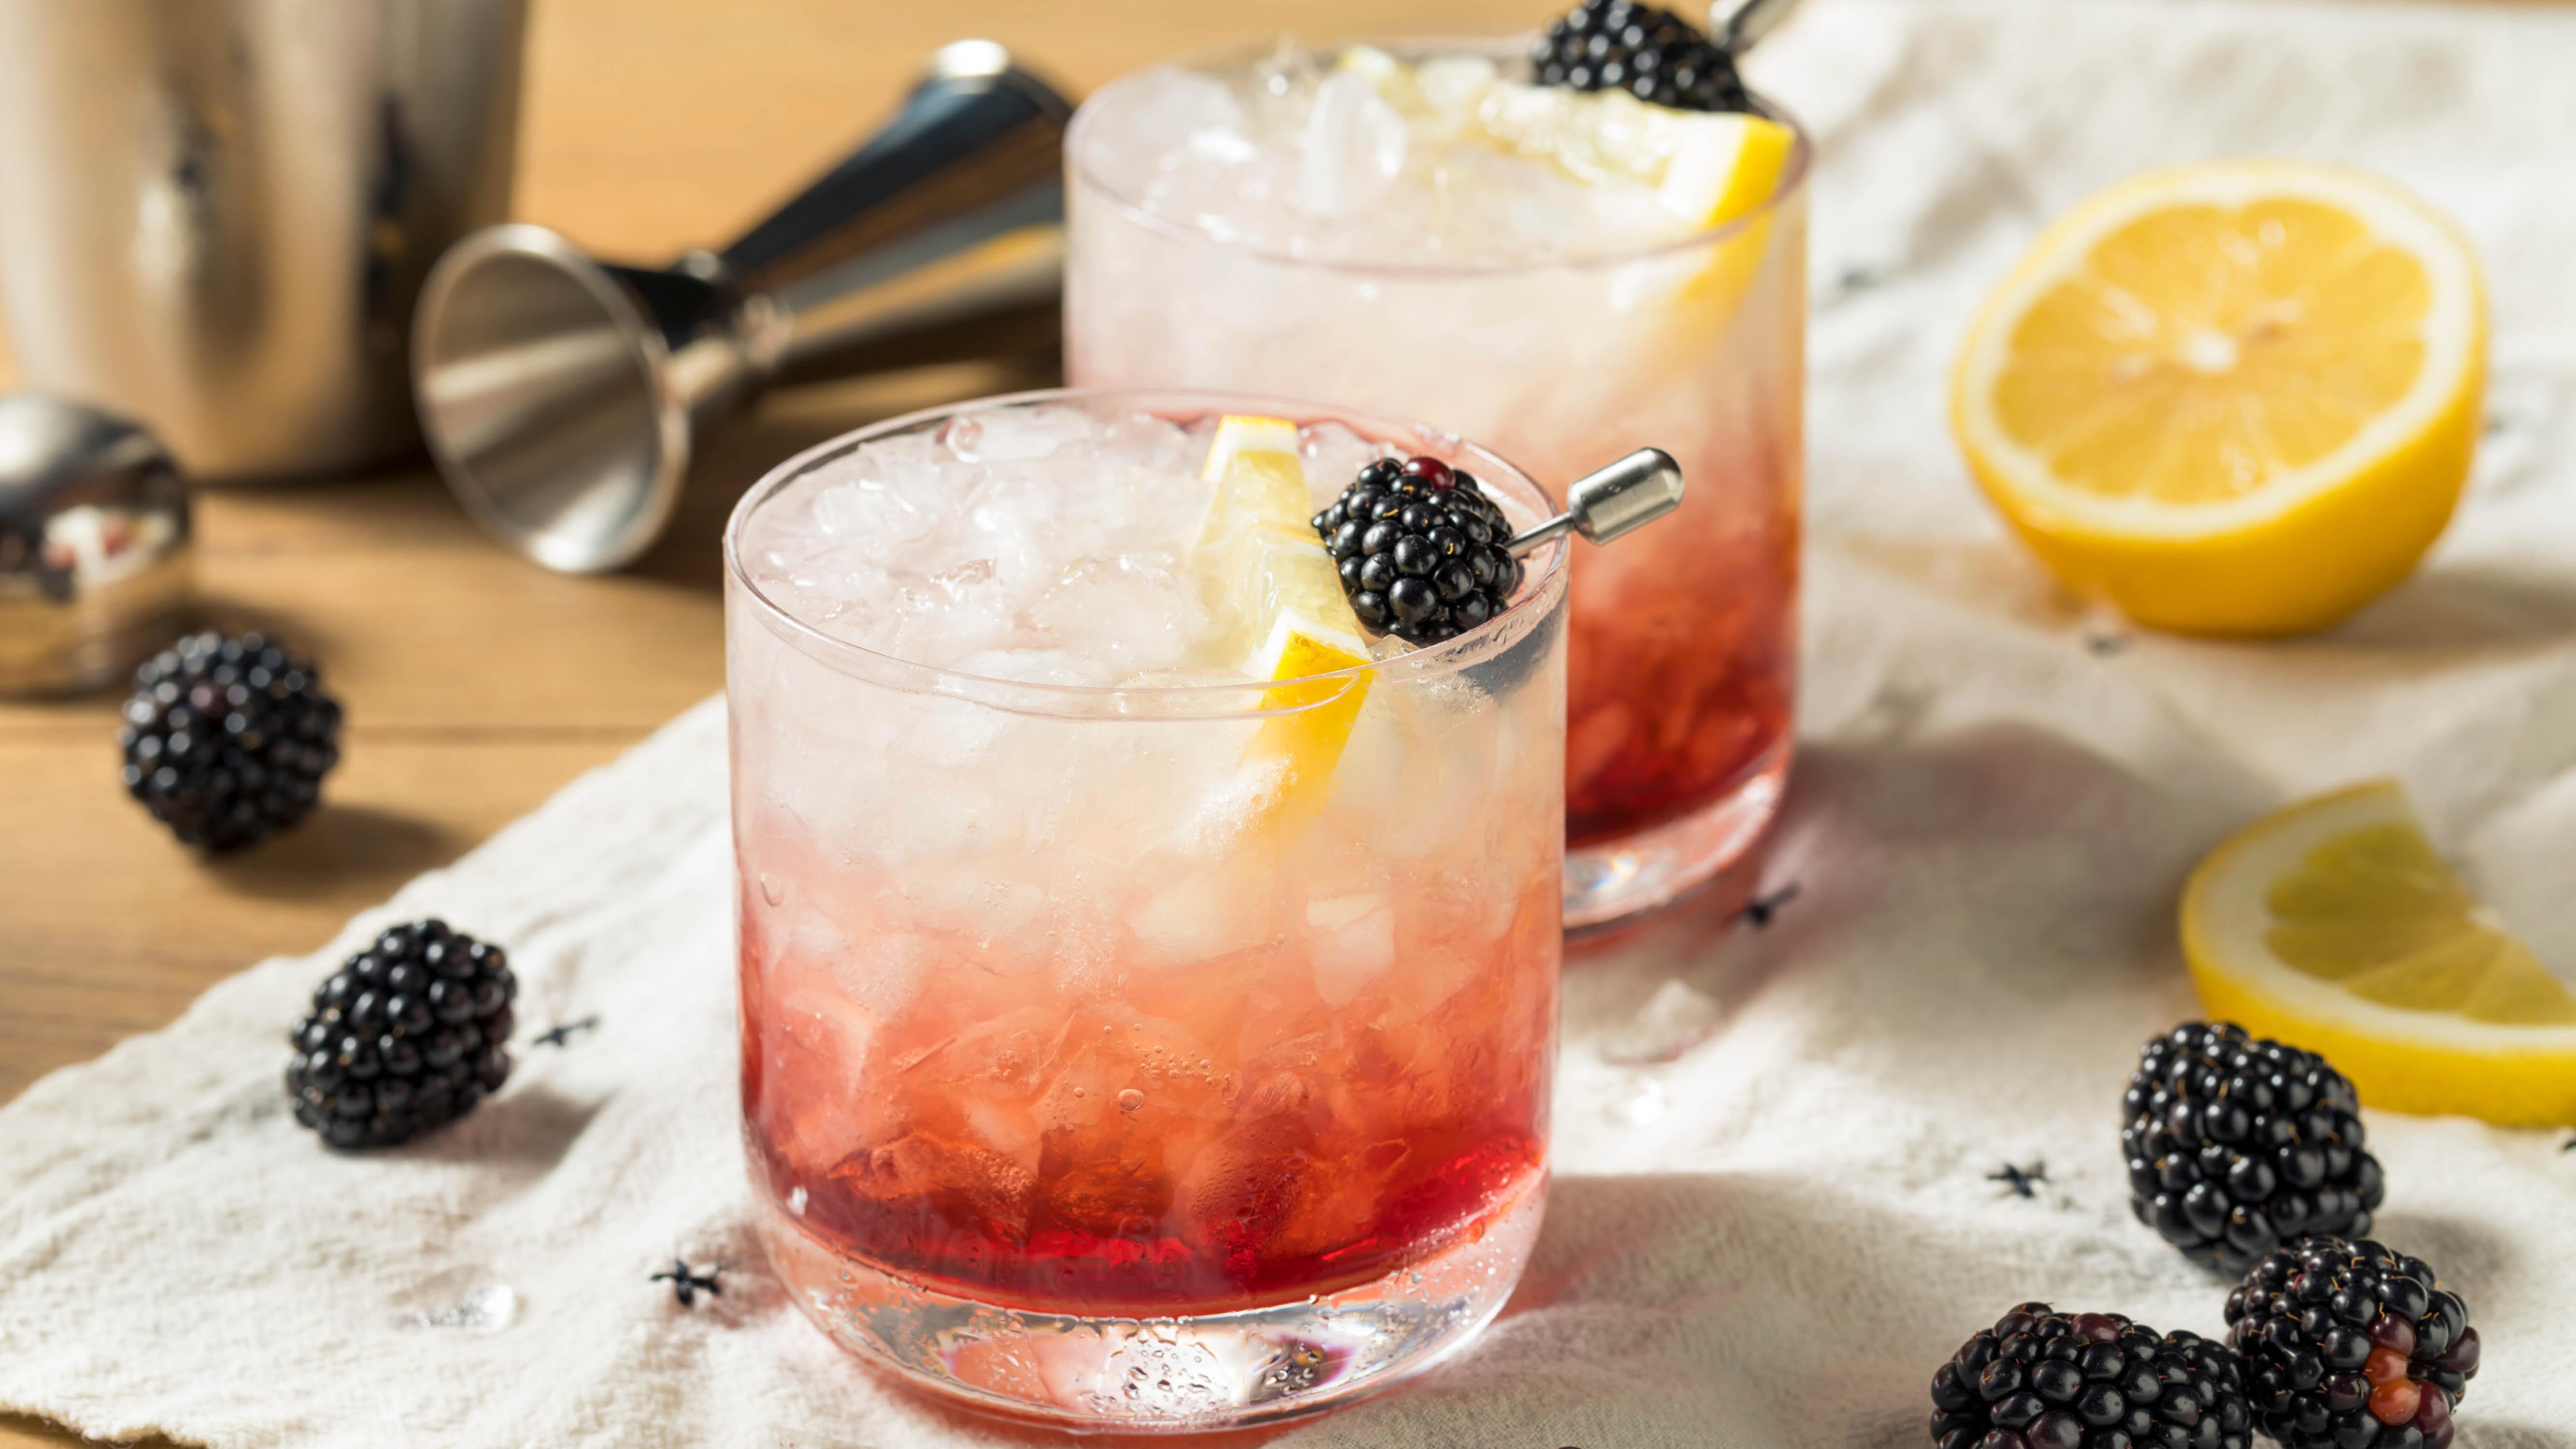 cocktails-vodka-or-gin-raspberry-and-lemon.jpg